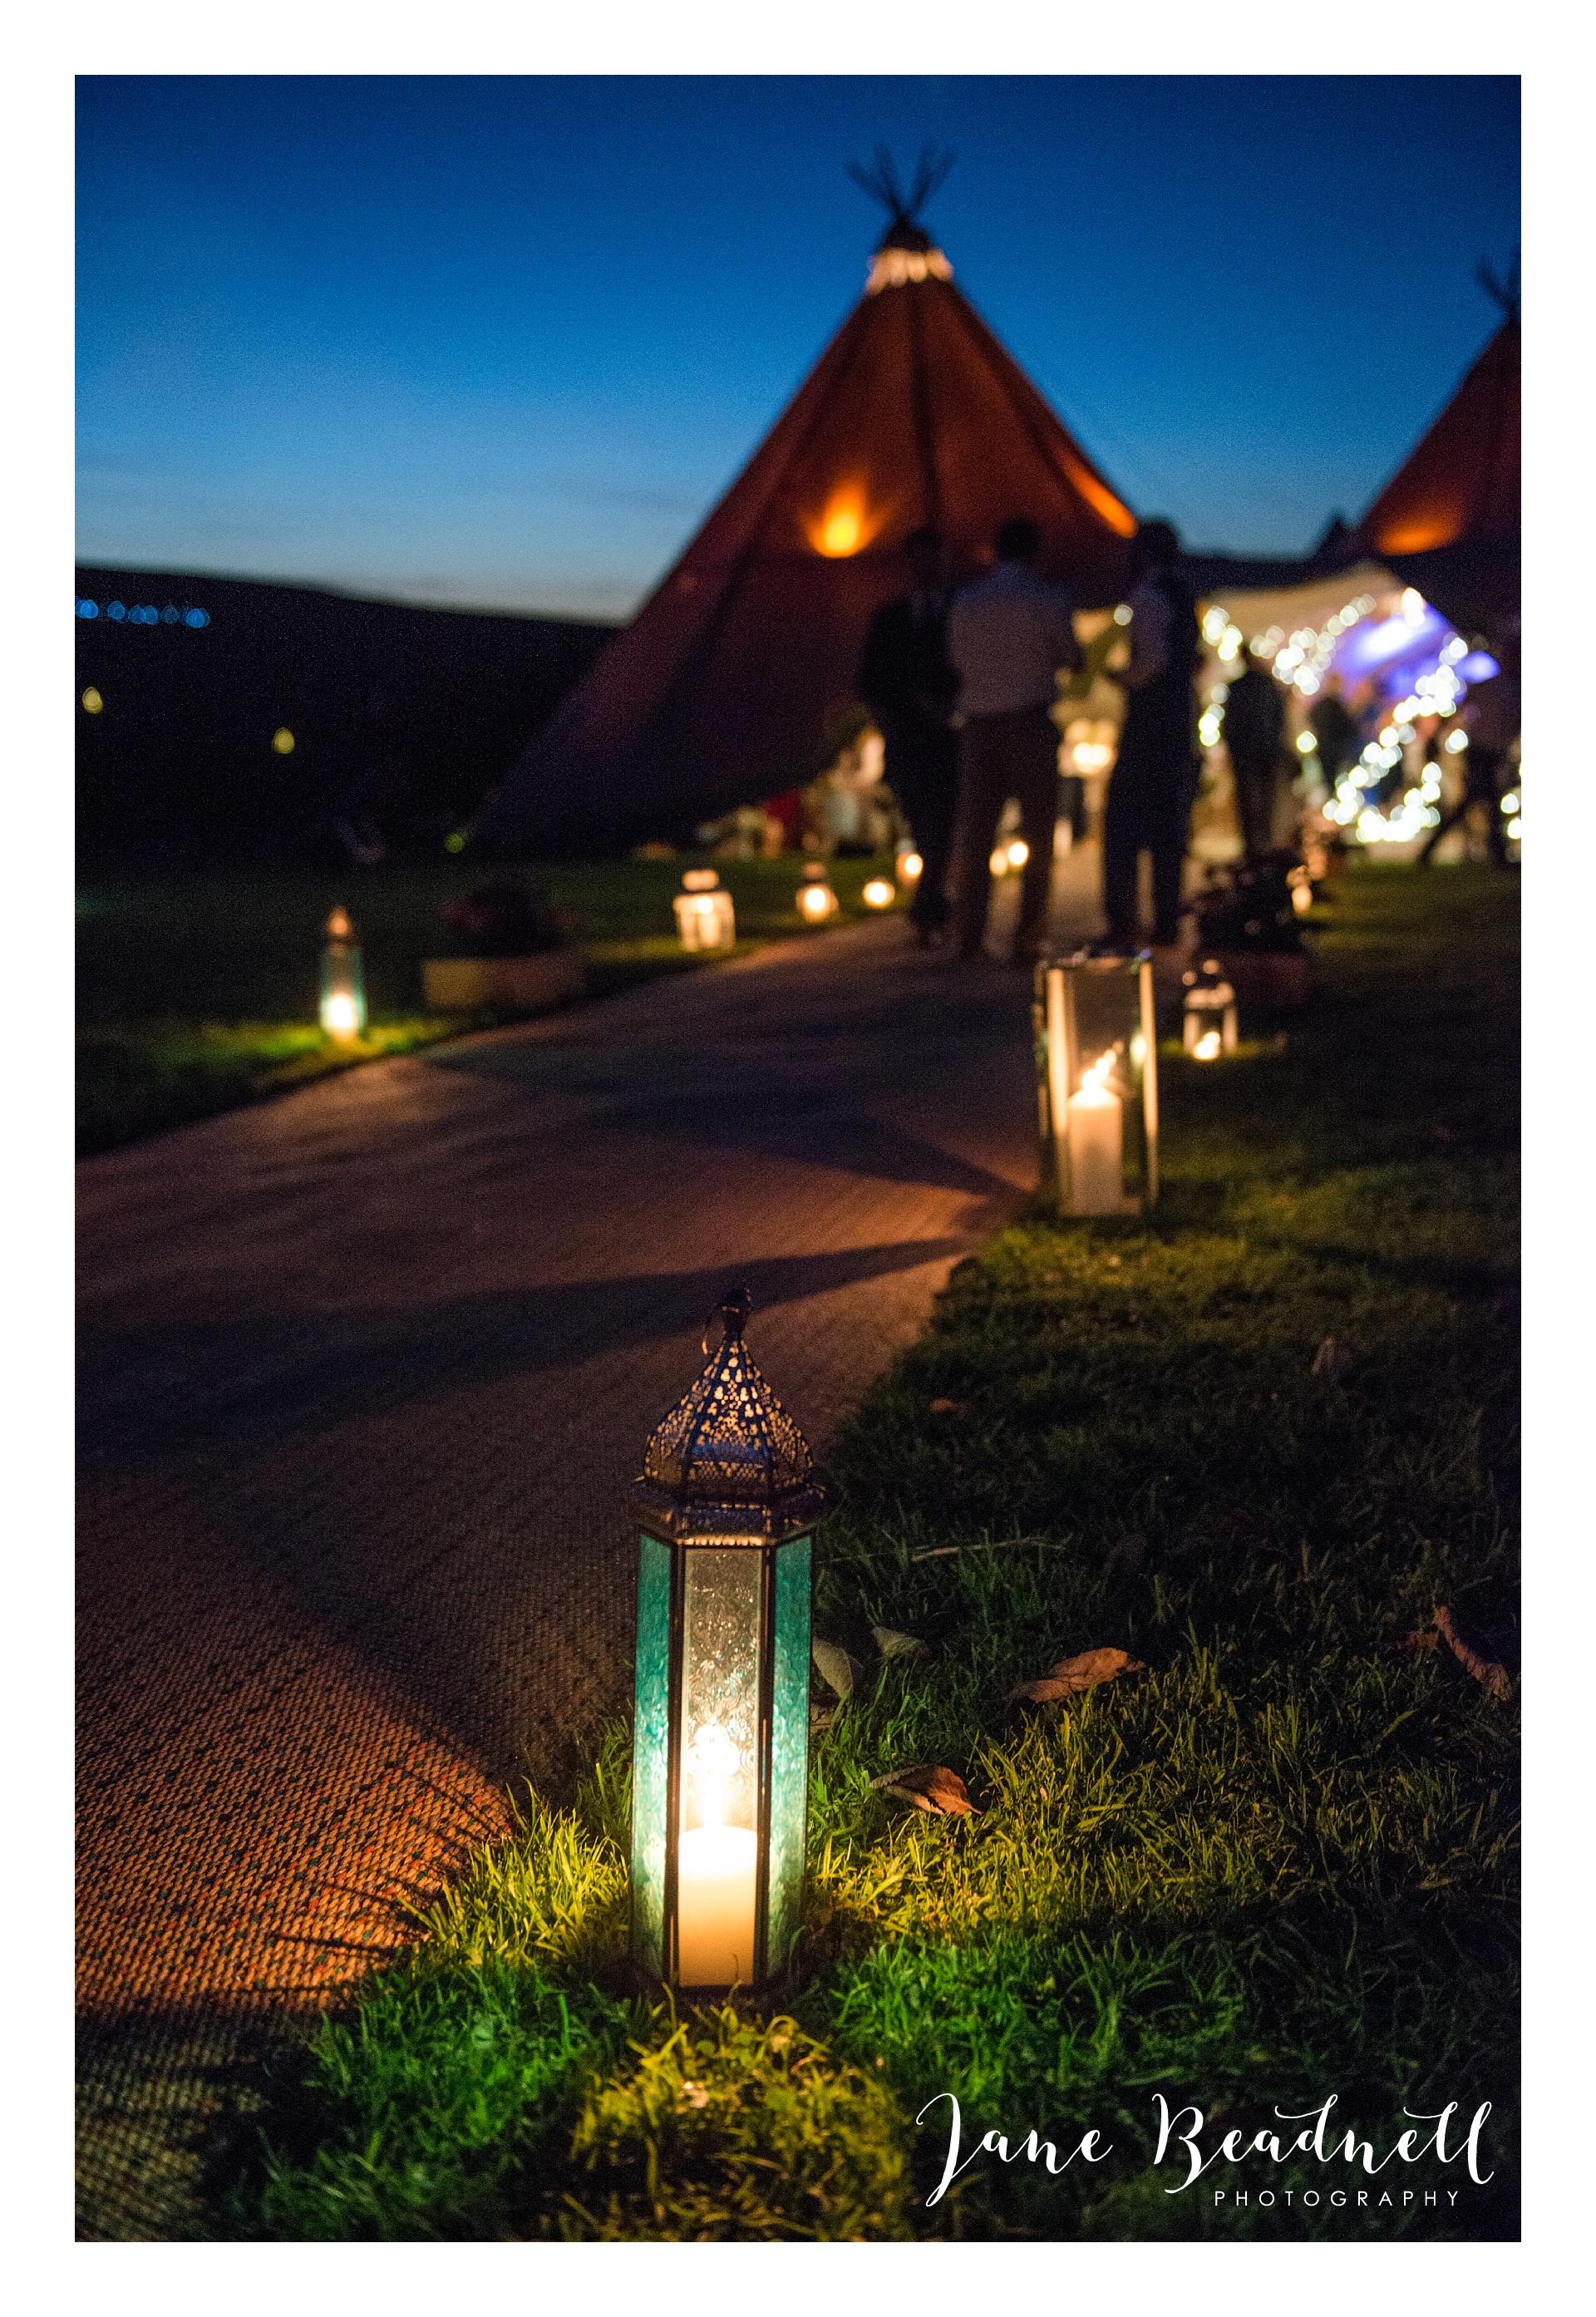 fine-art-wedding-photographer-jane-beadnell-yorkshire-wedding-photographer_0165